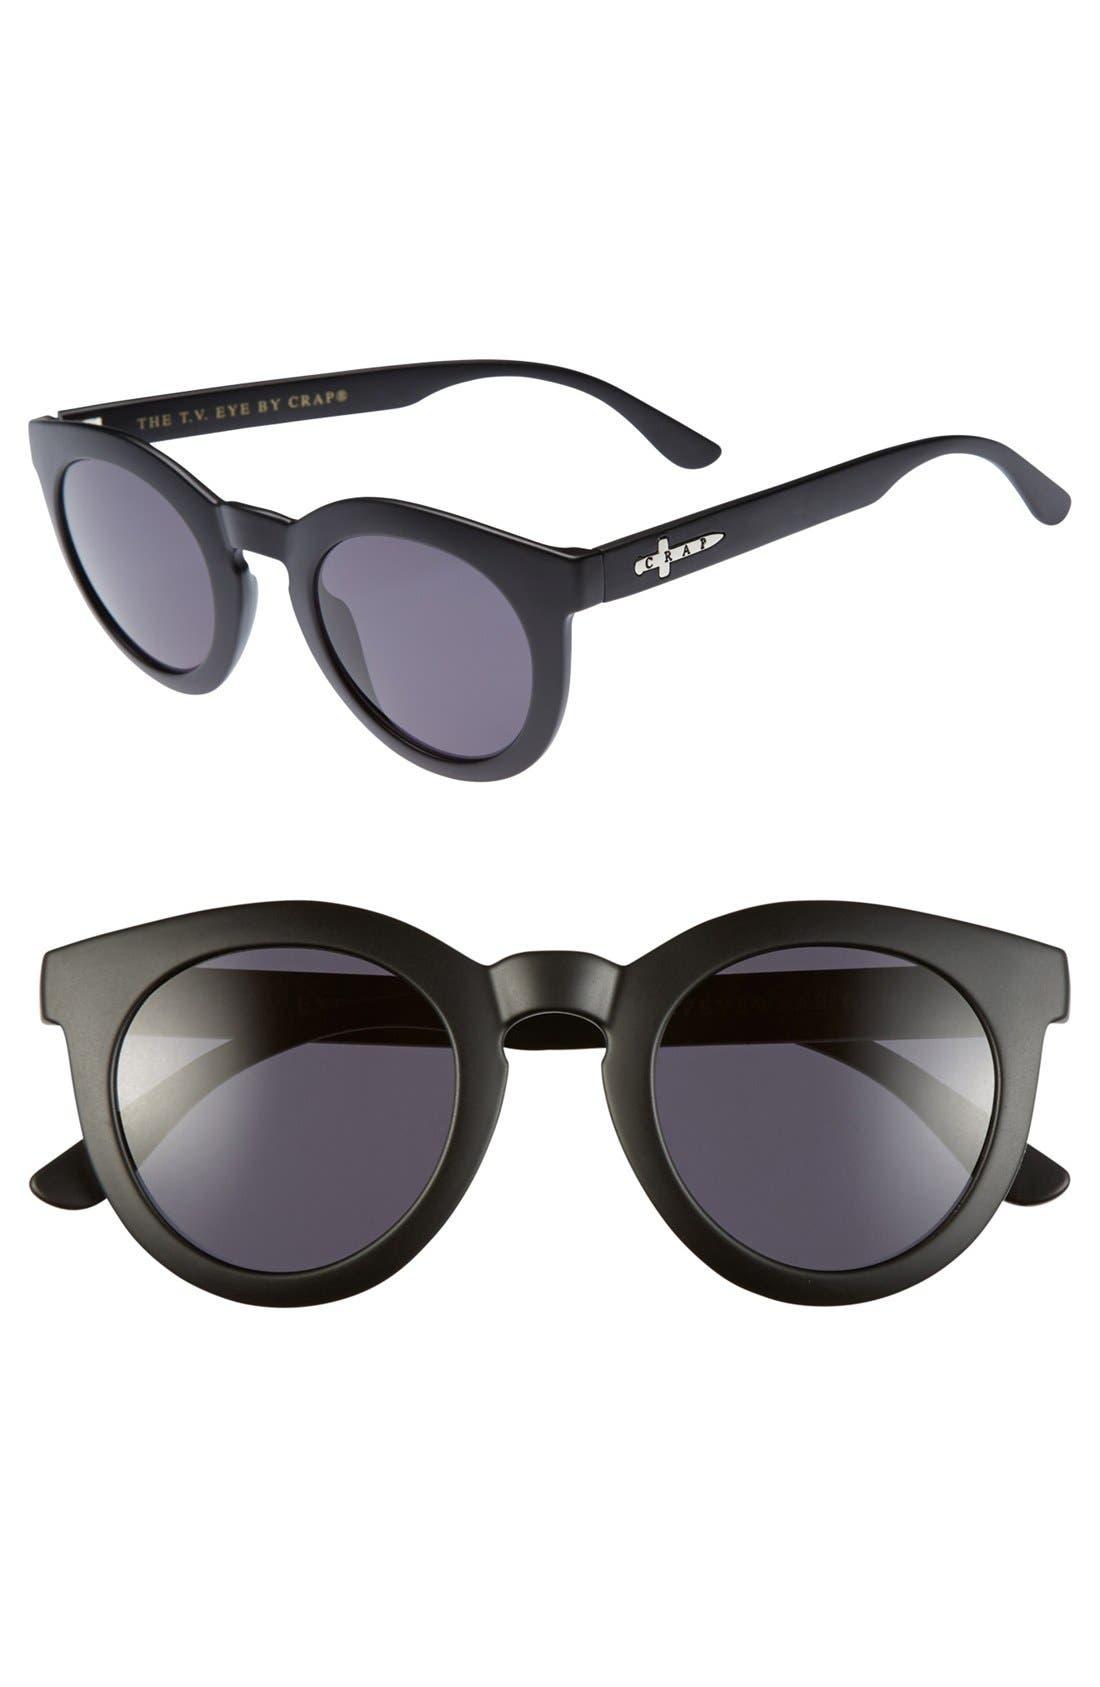 Main Image - CRAP Eyewear 'The T.V. Eye' 55mm Sunglasses